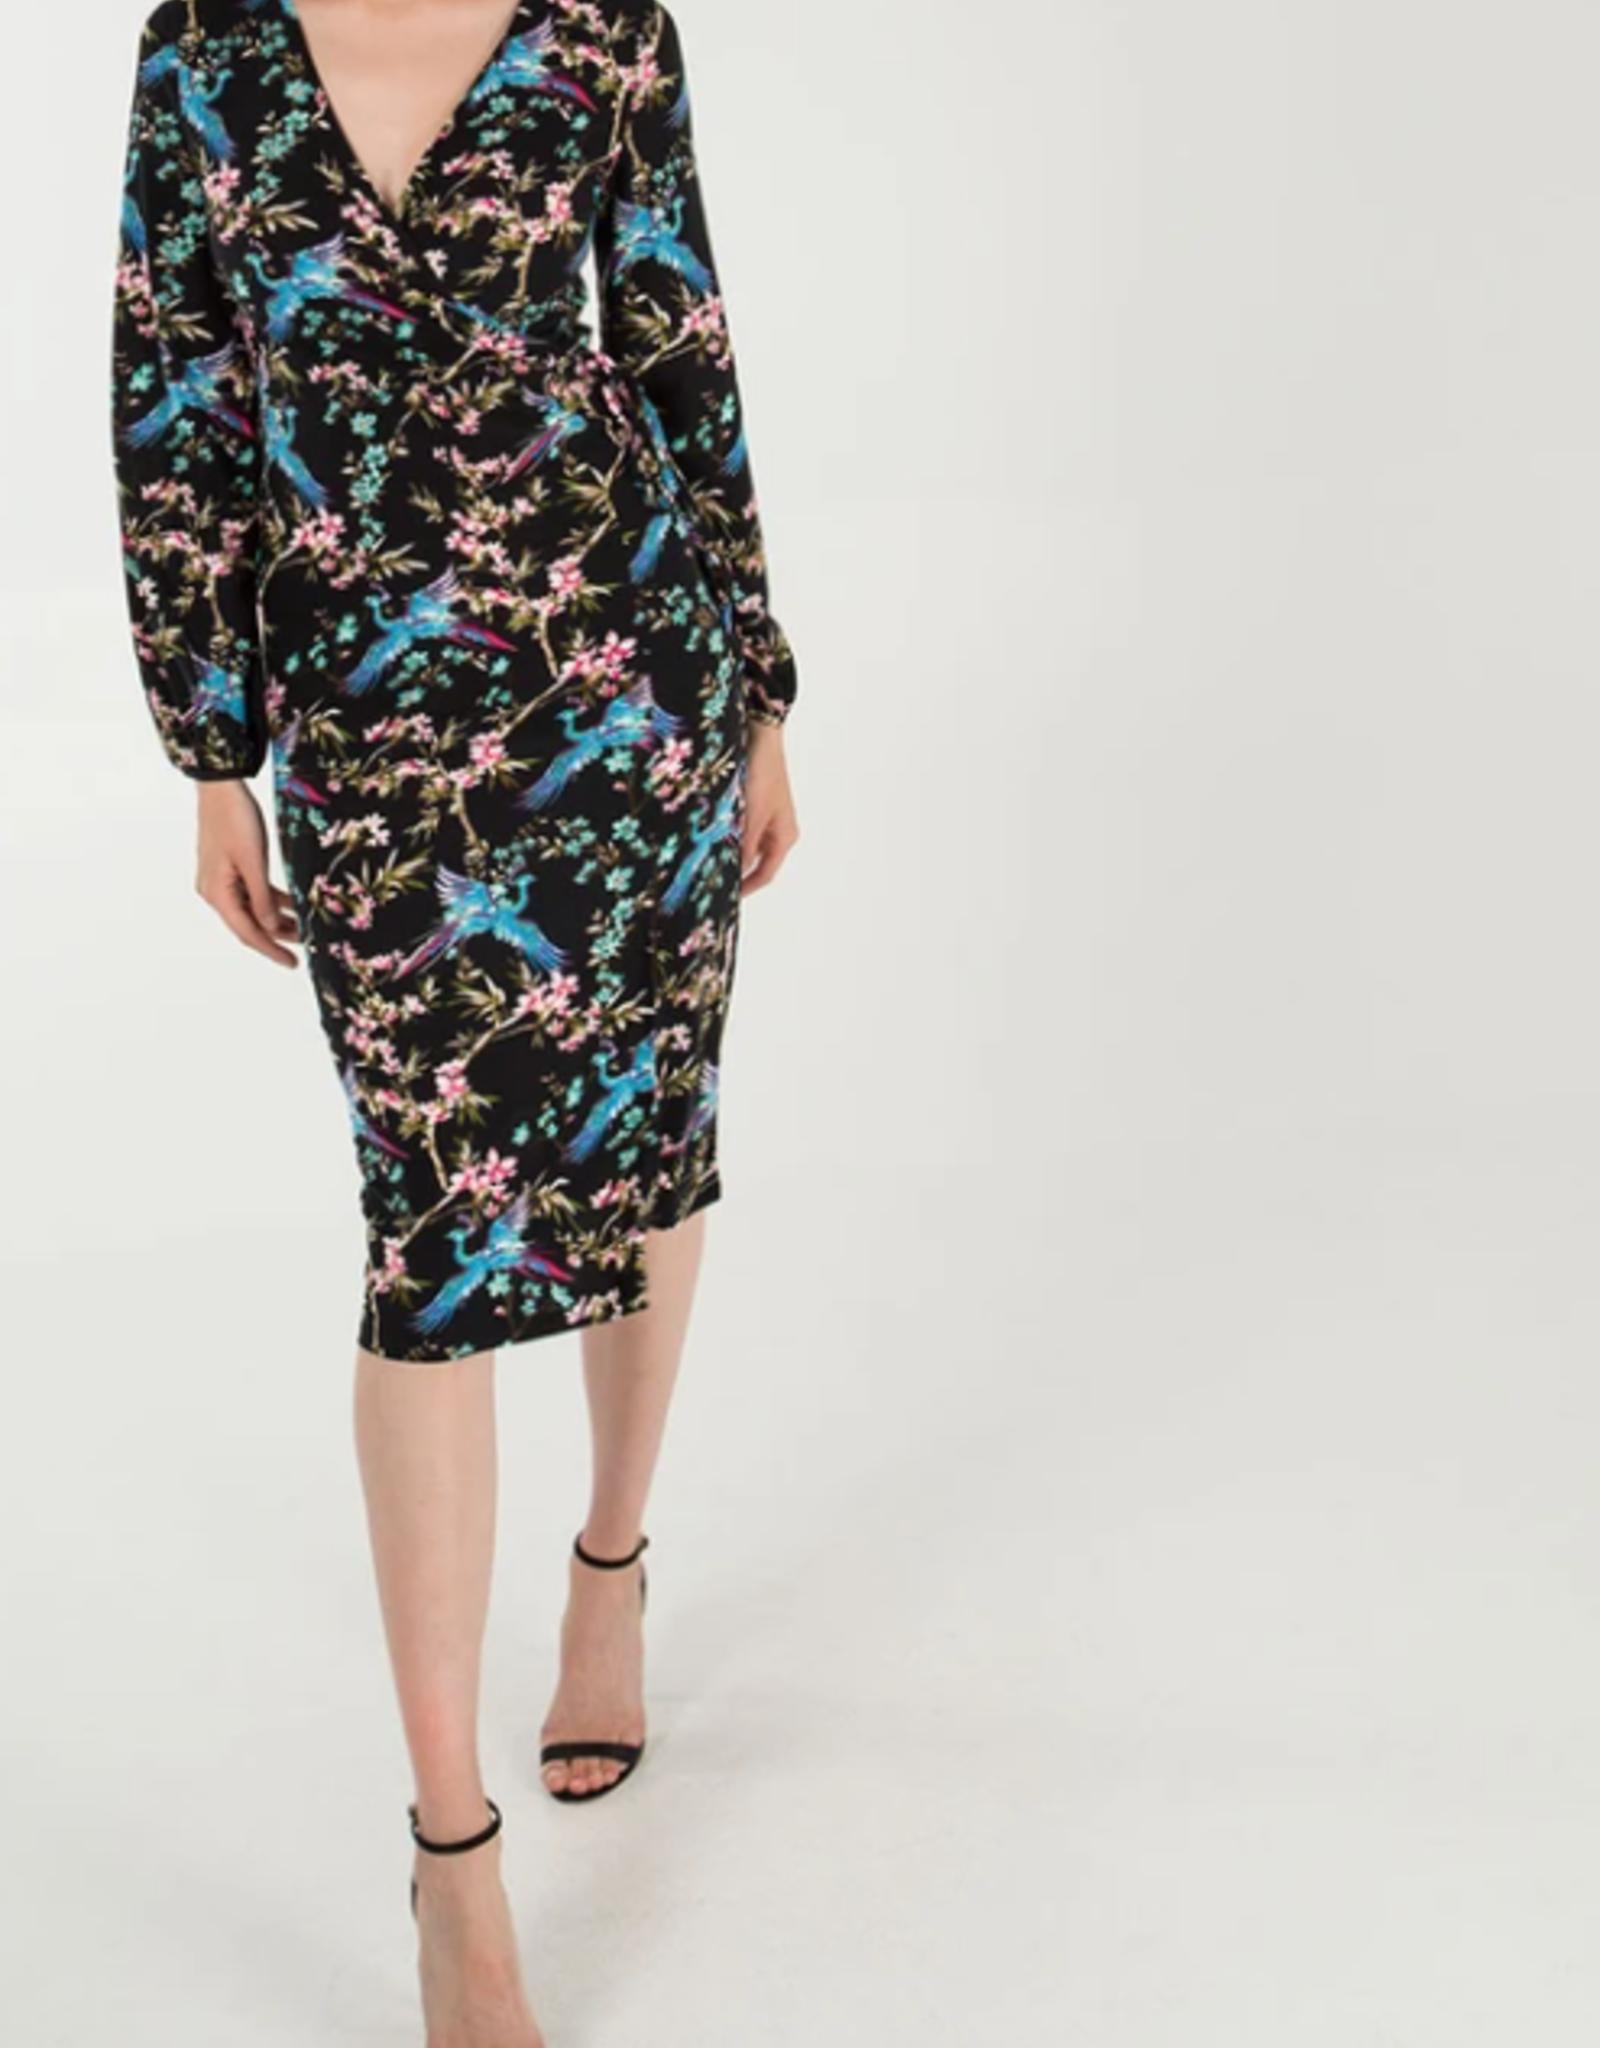 Nova London wrap chinoise dress